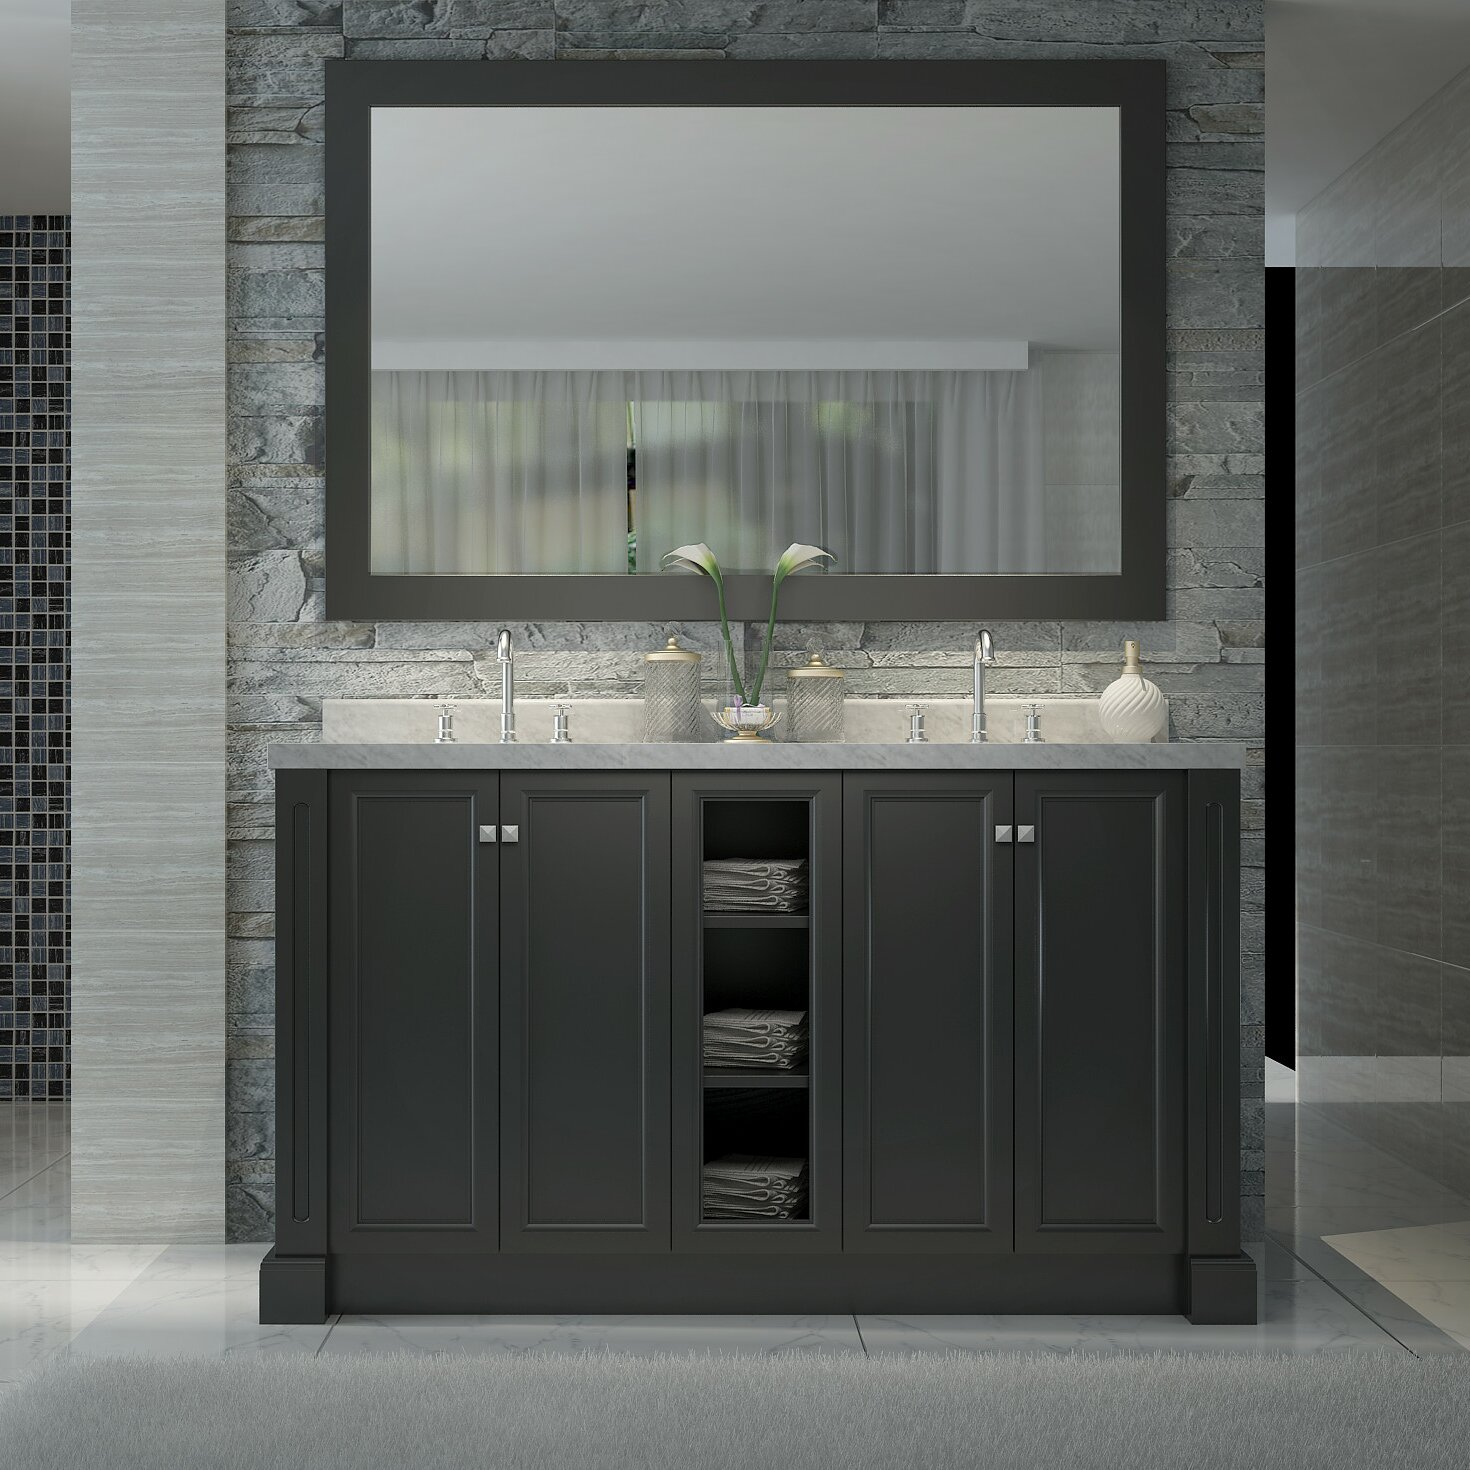 Virtu Usa Ava 61 Single Bathroom Vanity Set In White